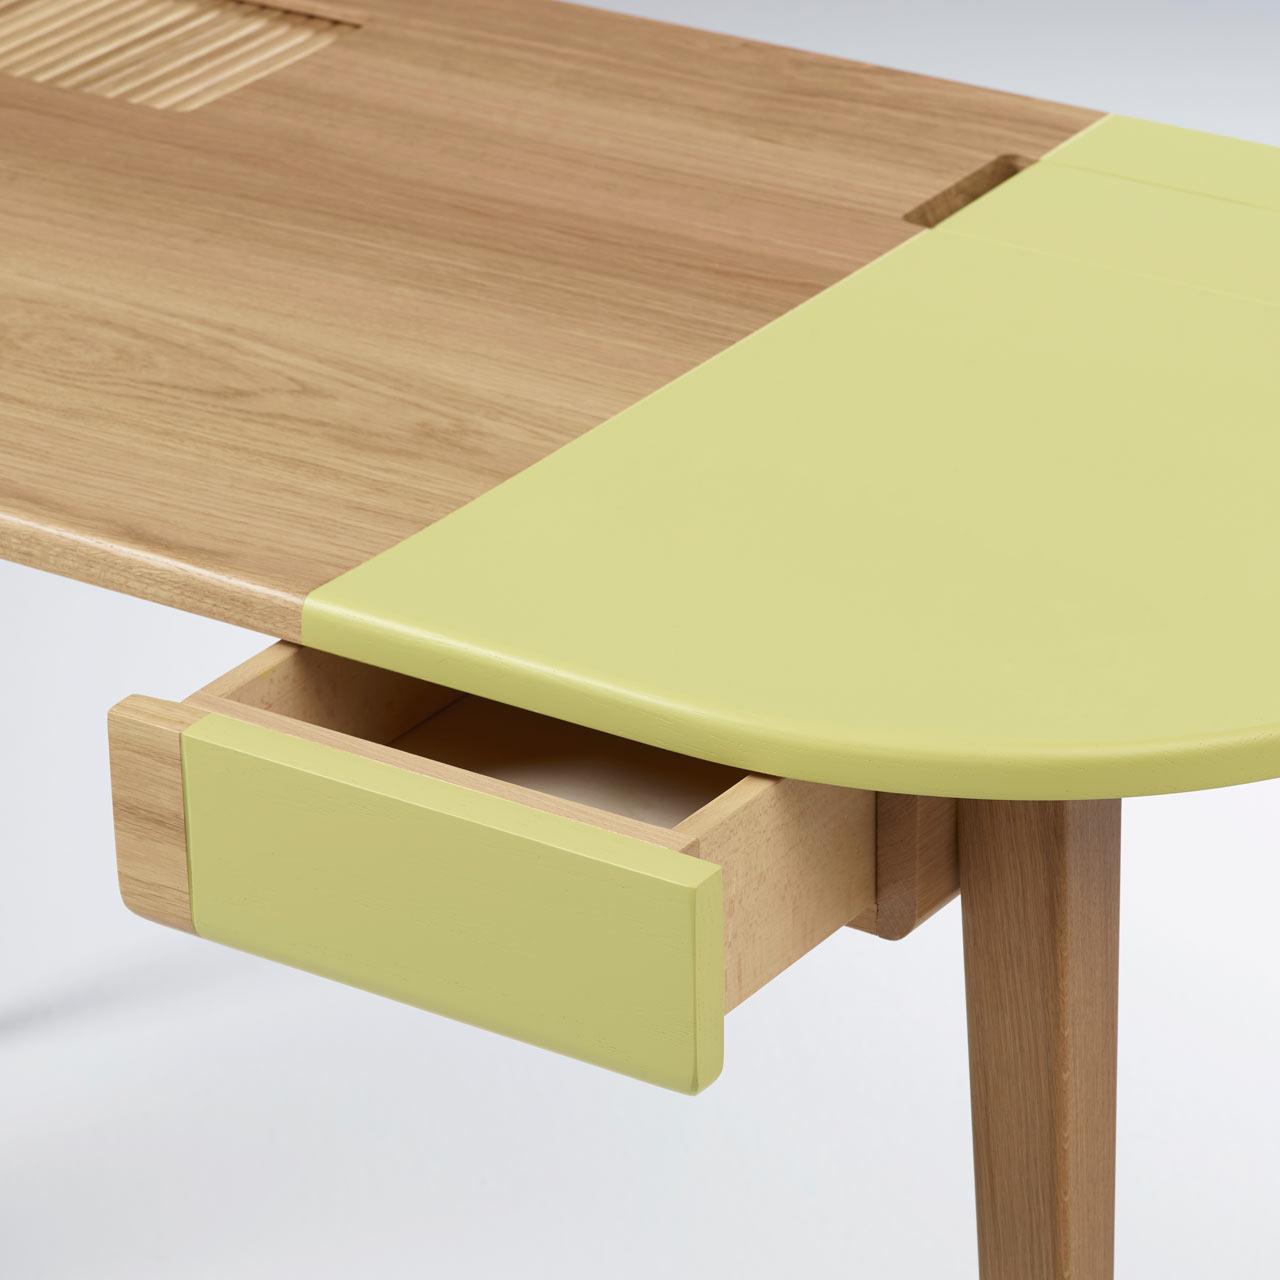 Julie-Gaillard-Latitude-Furniture-hisheji (11)